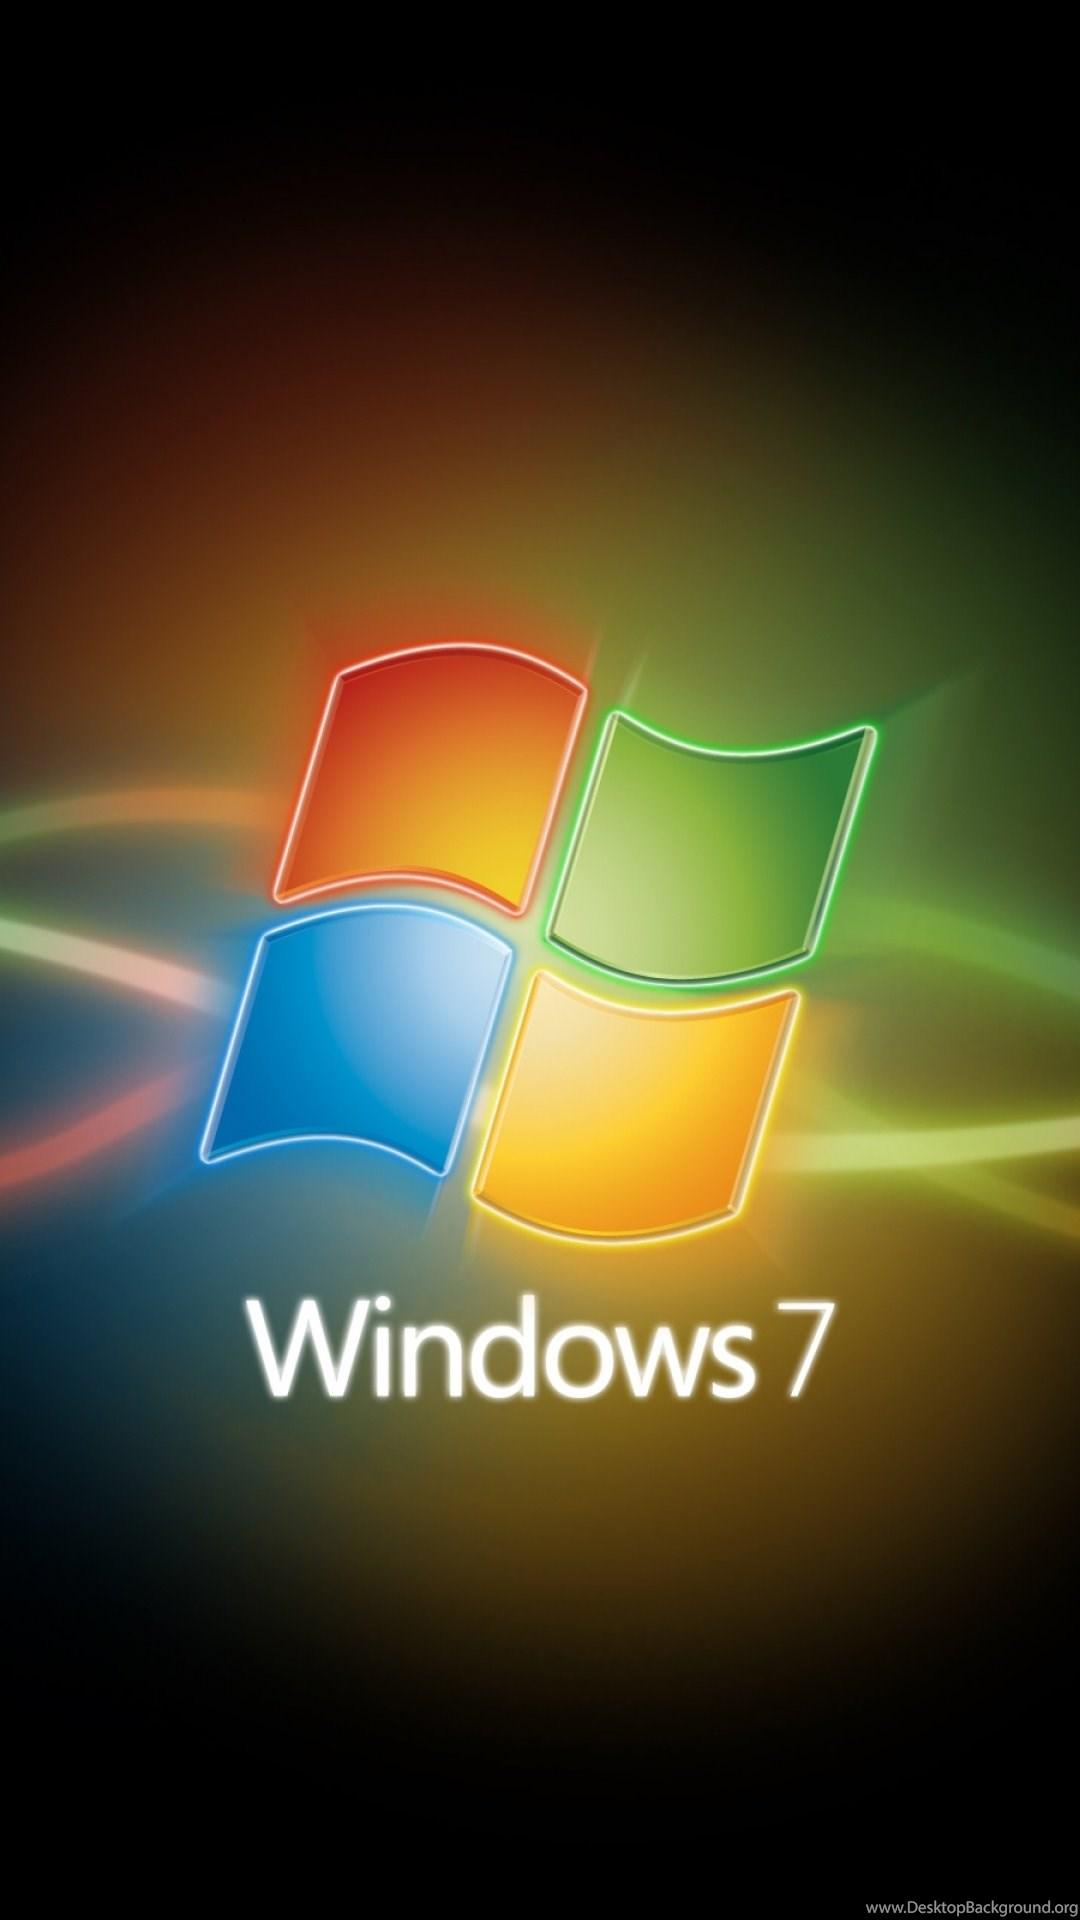 Wallpaper: Logo, Yellow, Green, Windows 7, Red, Line, Blue